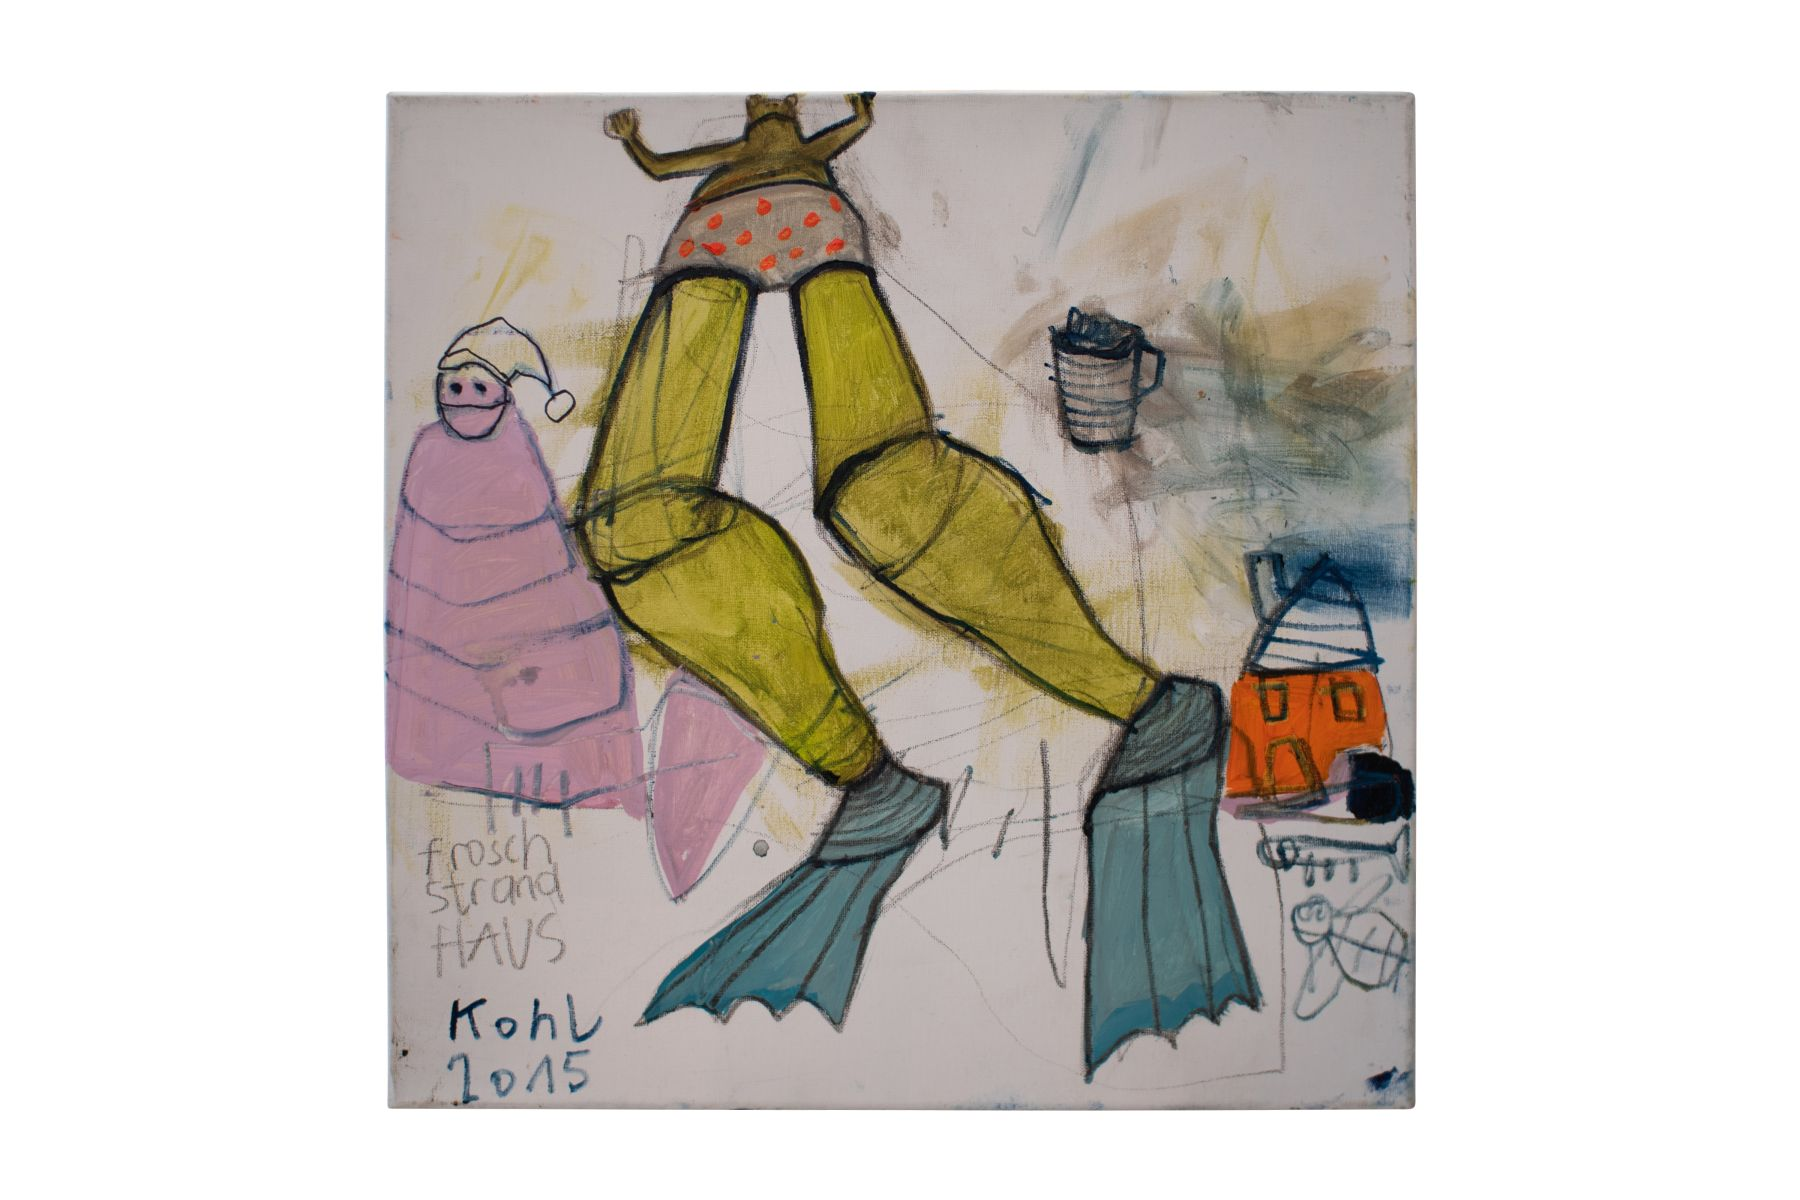 "#51 Peter Kohl(1971) "" Frog beach house"" 2015 | Peter Kohl(1971) ""Frosch Strandhaus"" 2015 Image"